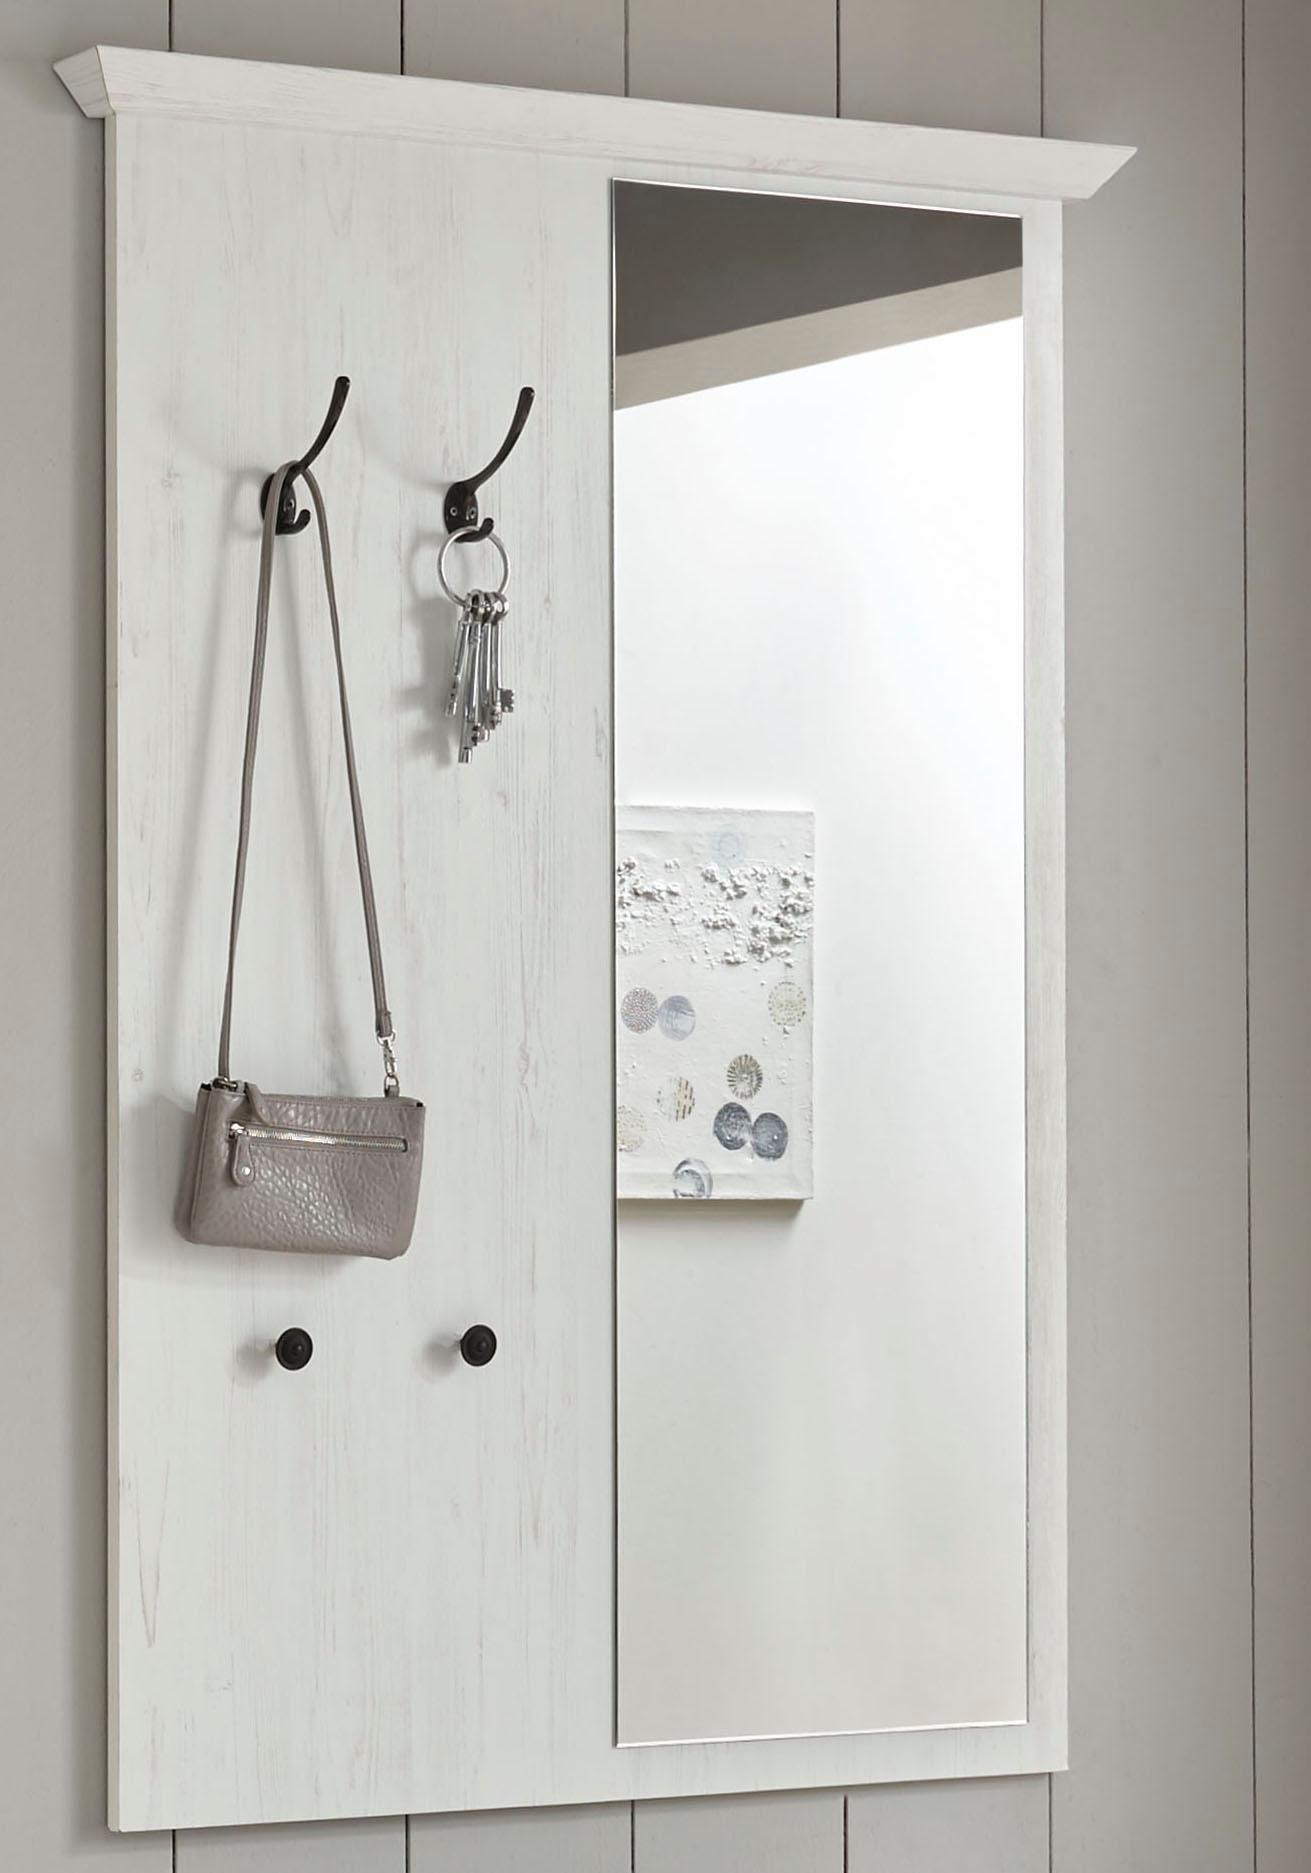 garderobenpaneel preisvergleich die besten angebote. Black Bedroom Furniture Sets. Home Design Ideas